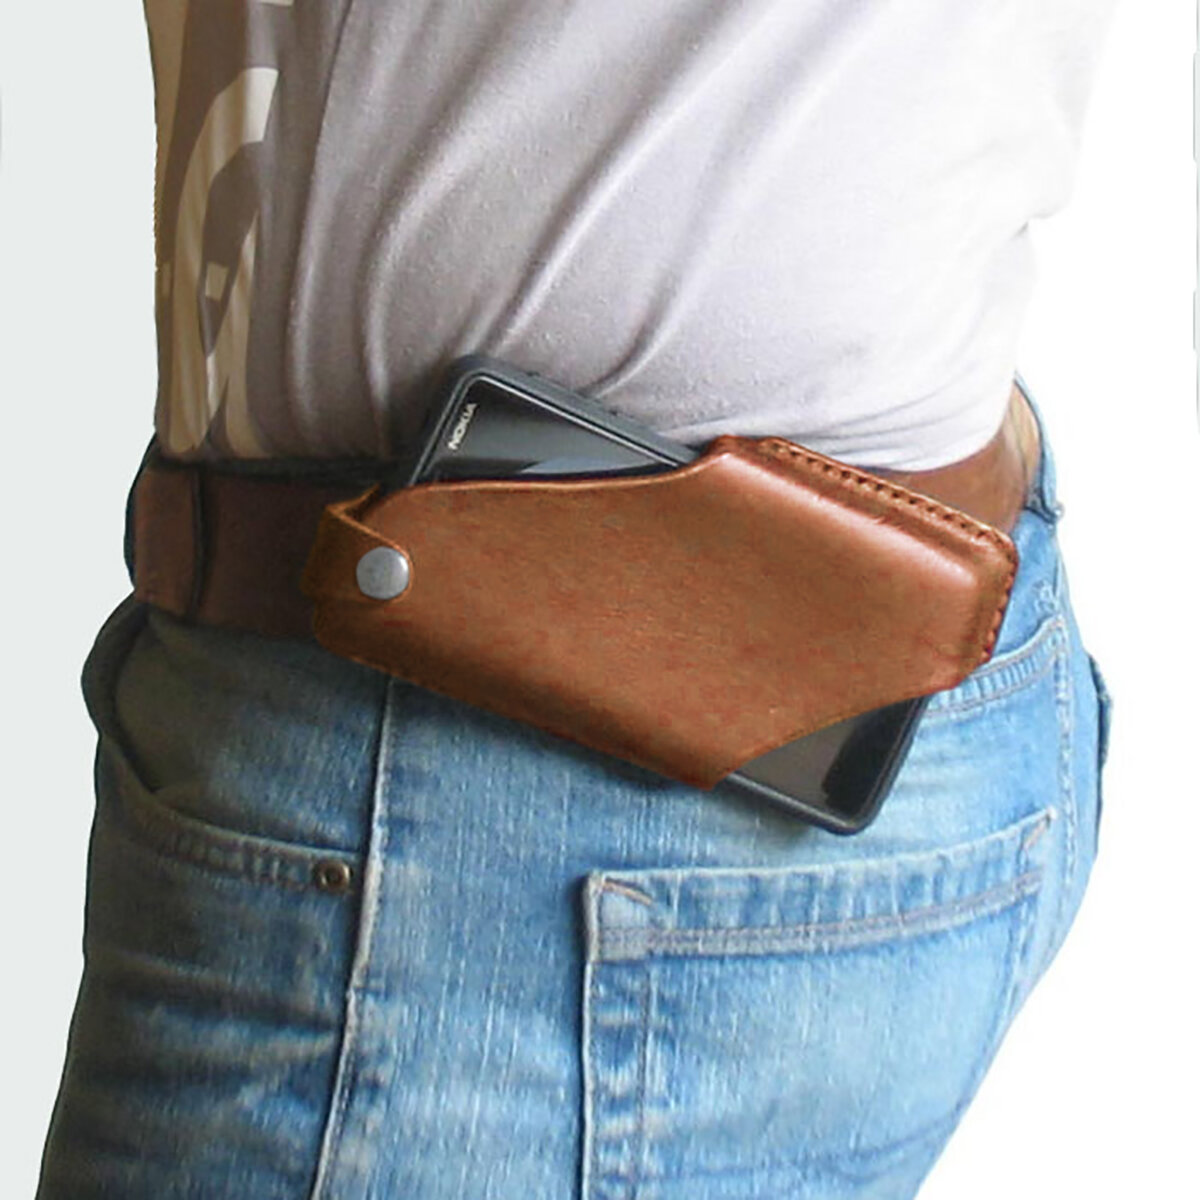 Homens Couro Genuíno 4.7inch ~ 6.5 polegadas Phone Bolsa Cintura Bolsa Fácil de transportar EDC Bolsa Para Outdoor